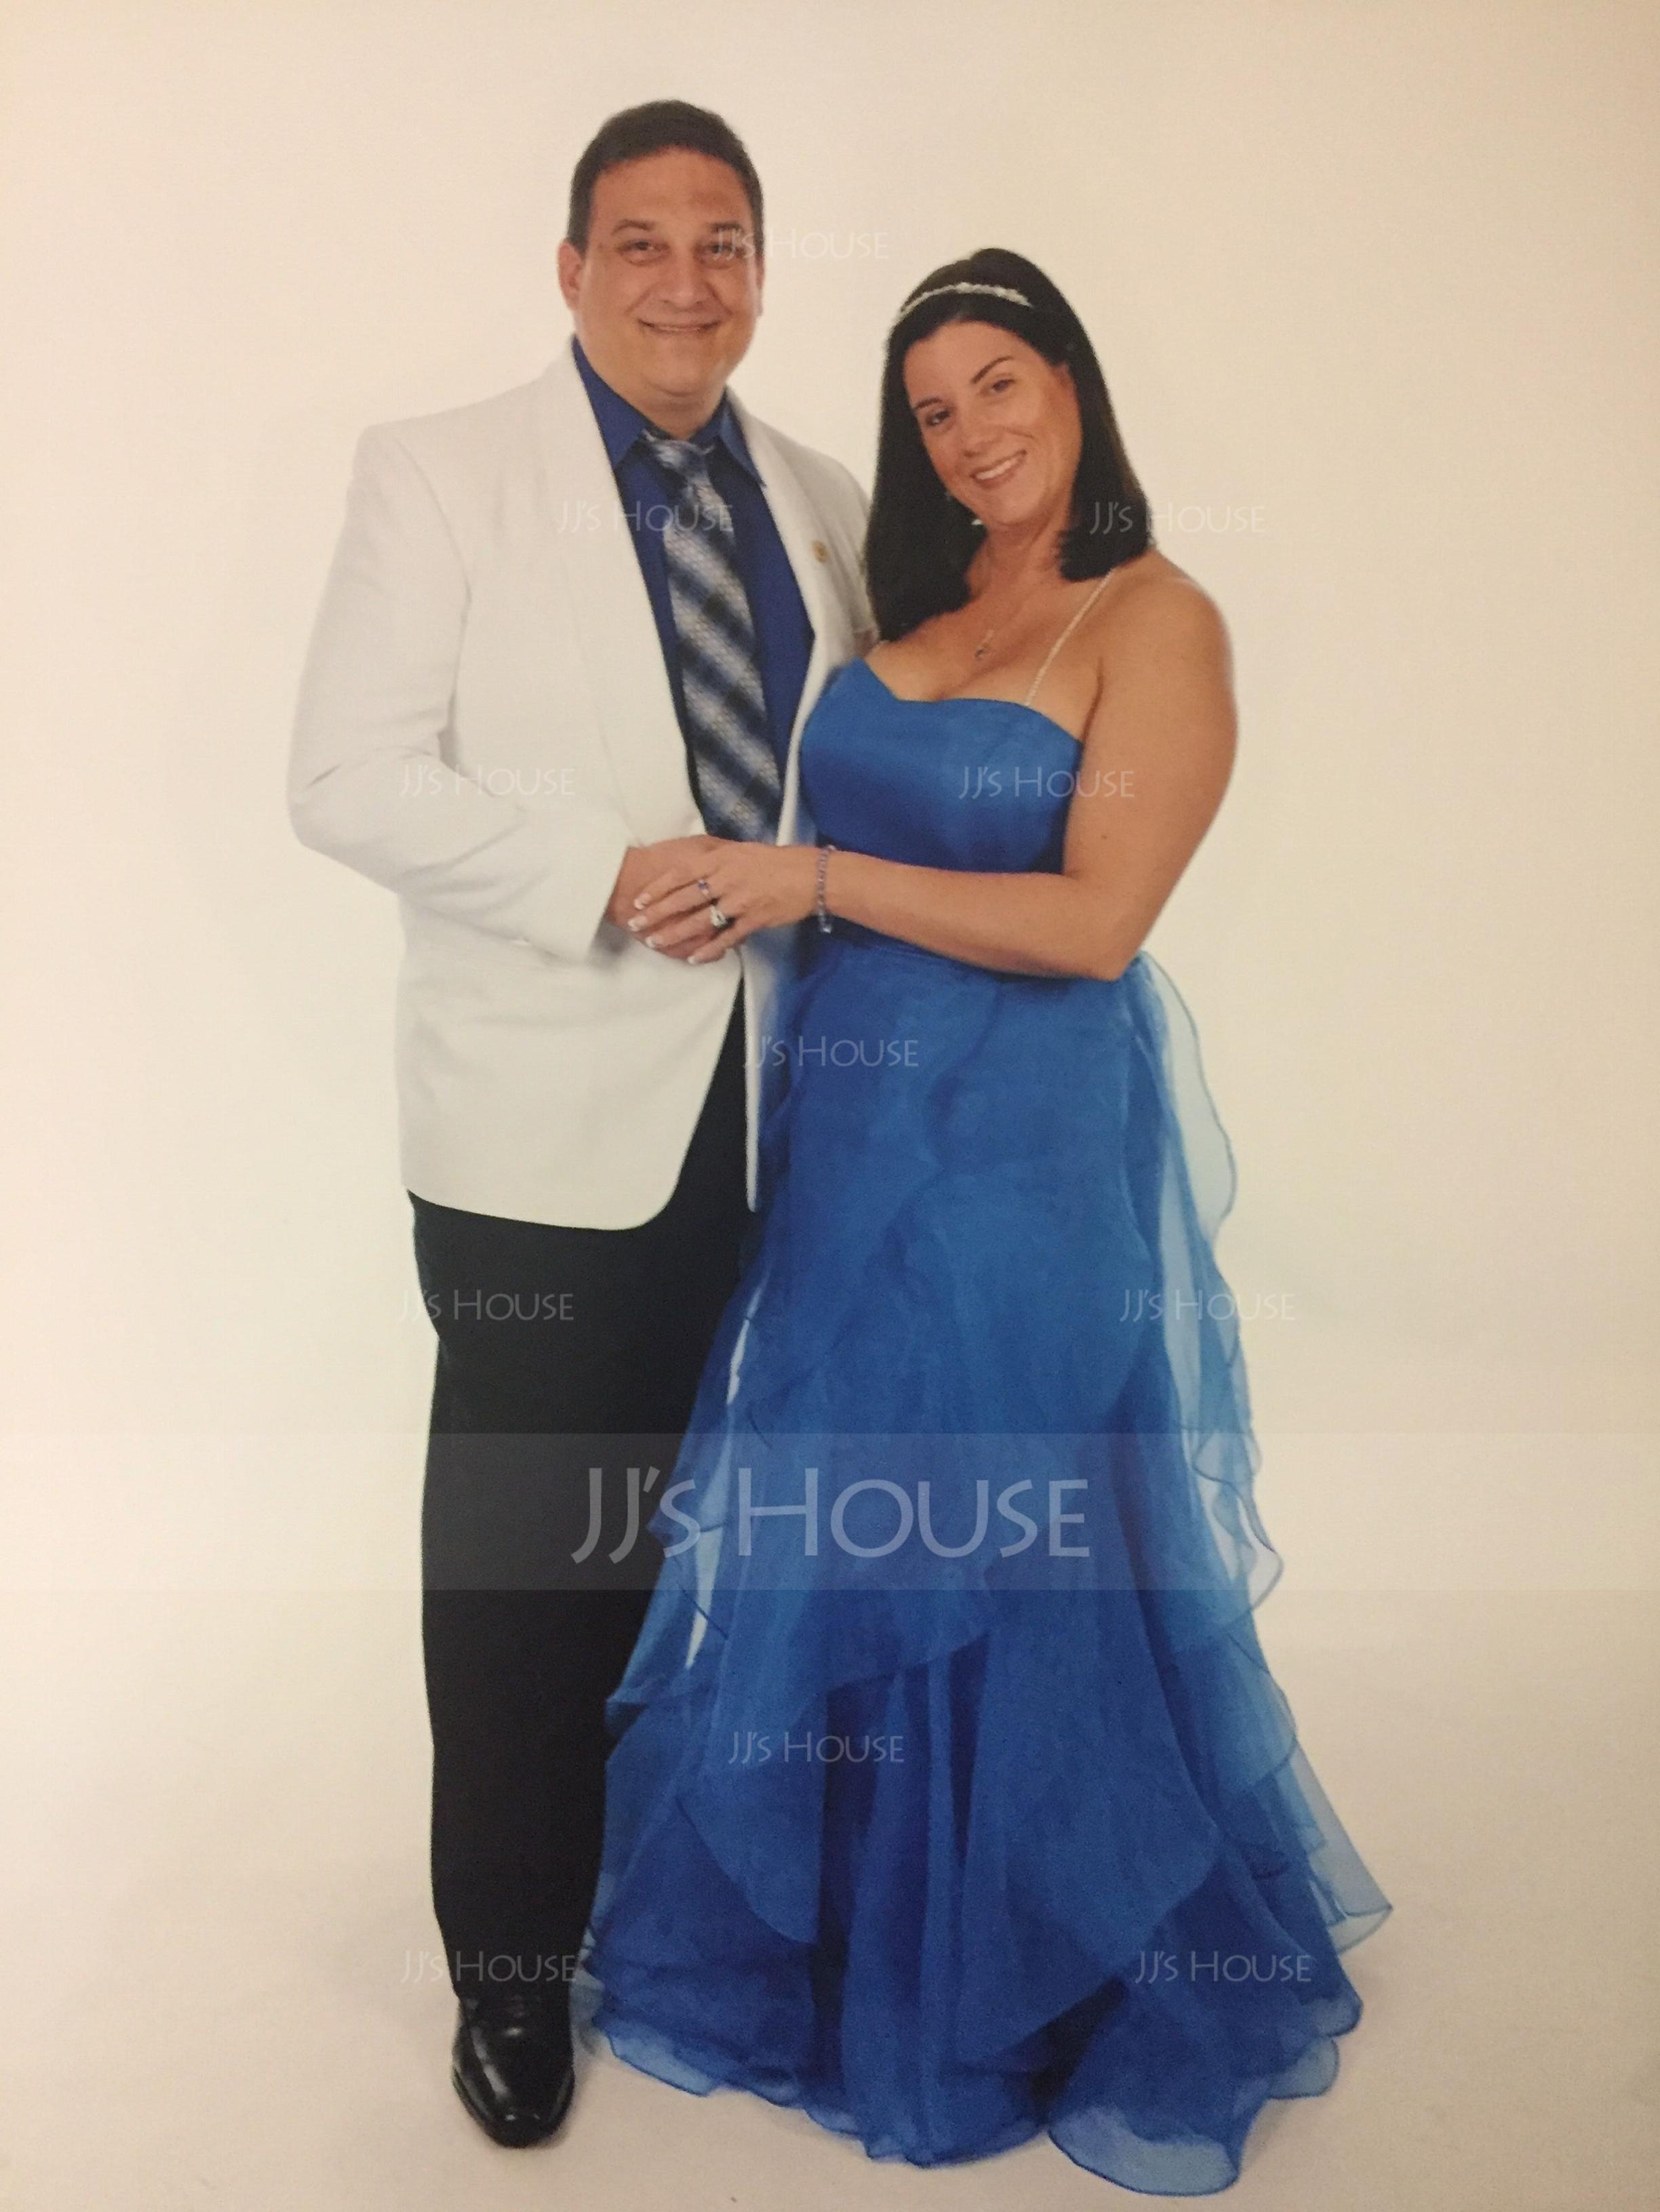 A-Line/Princess Sweetheart Floor-Length Organza Evening Dress With Cascading Ruffles (017013725)